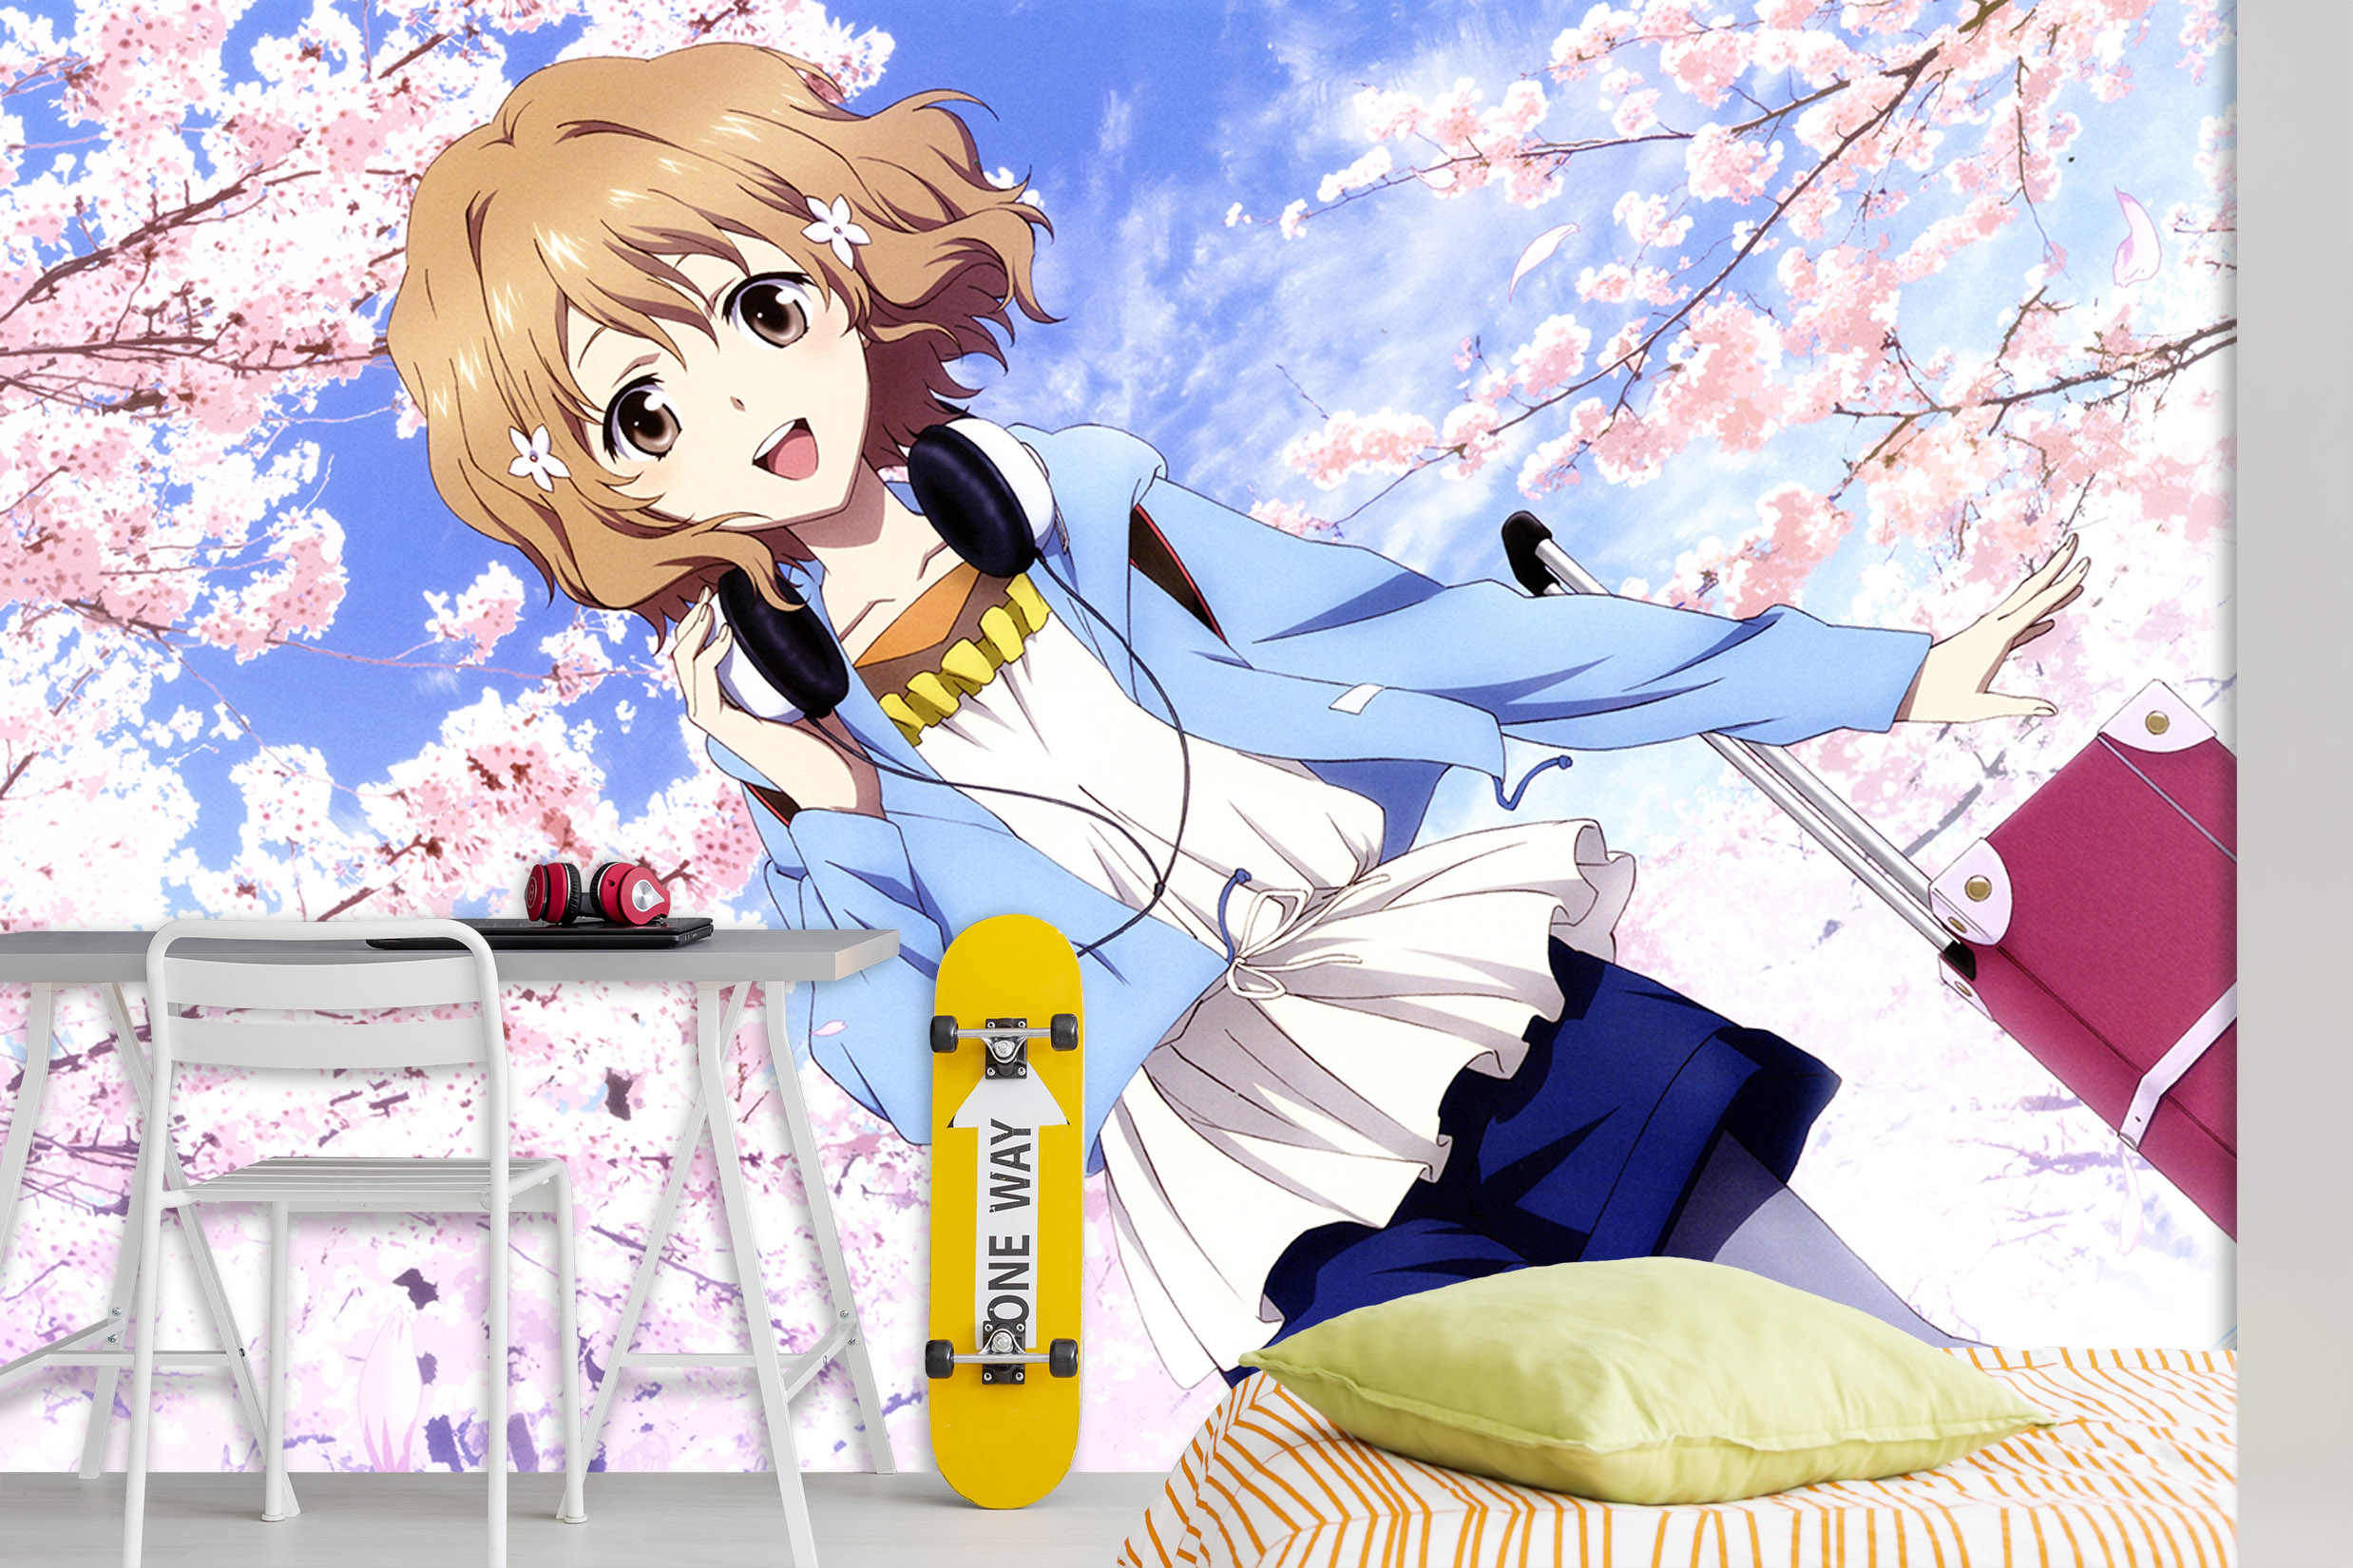 自己粘着 3d 漫画 657433 日本アニメ壁紙壁画壁印刷デカール壁の壁画